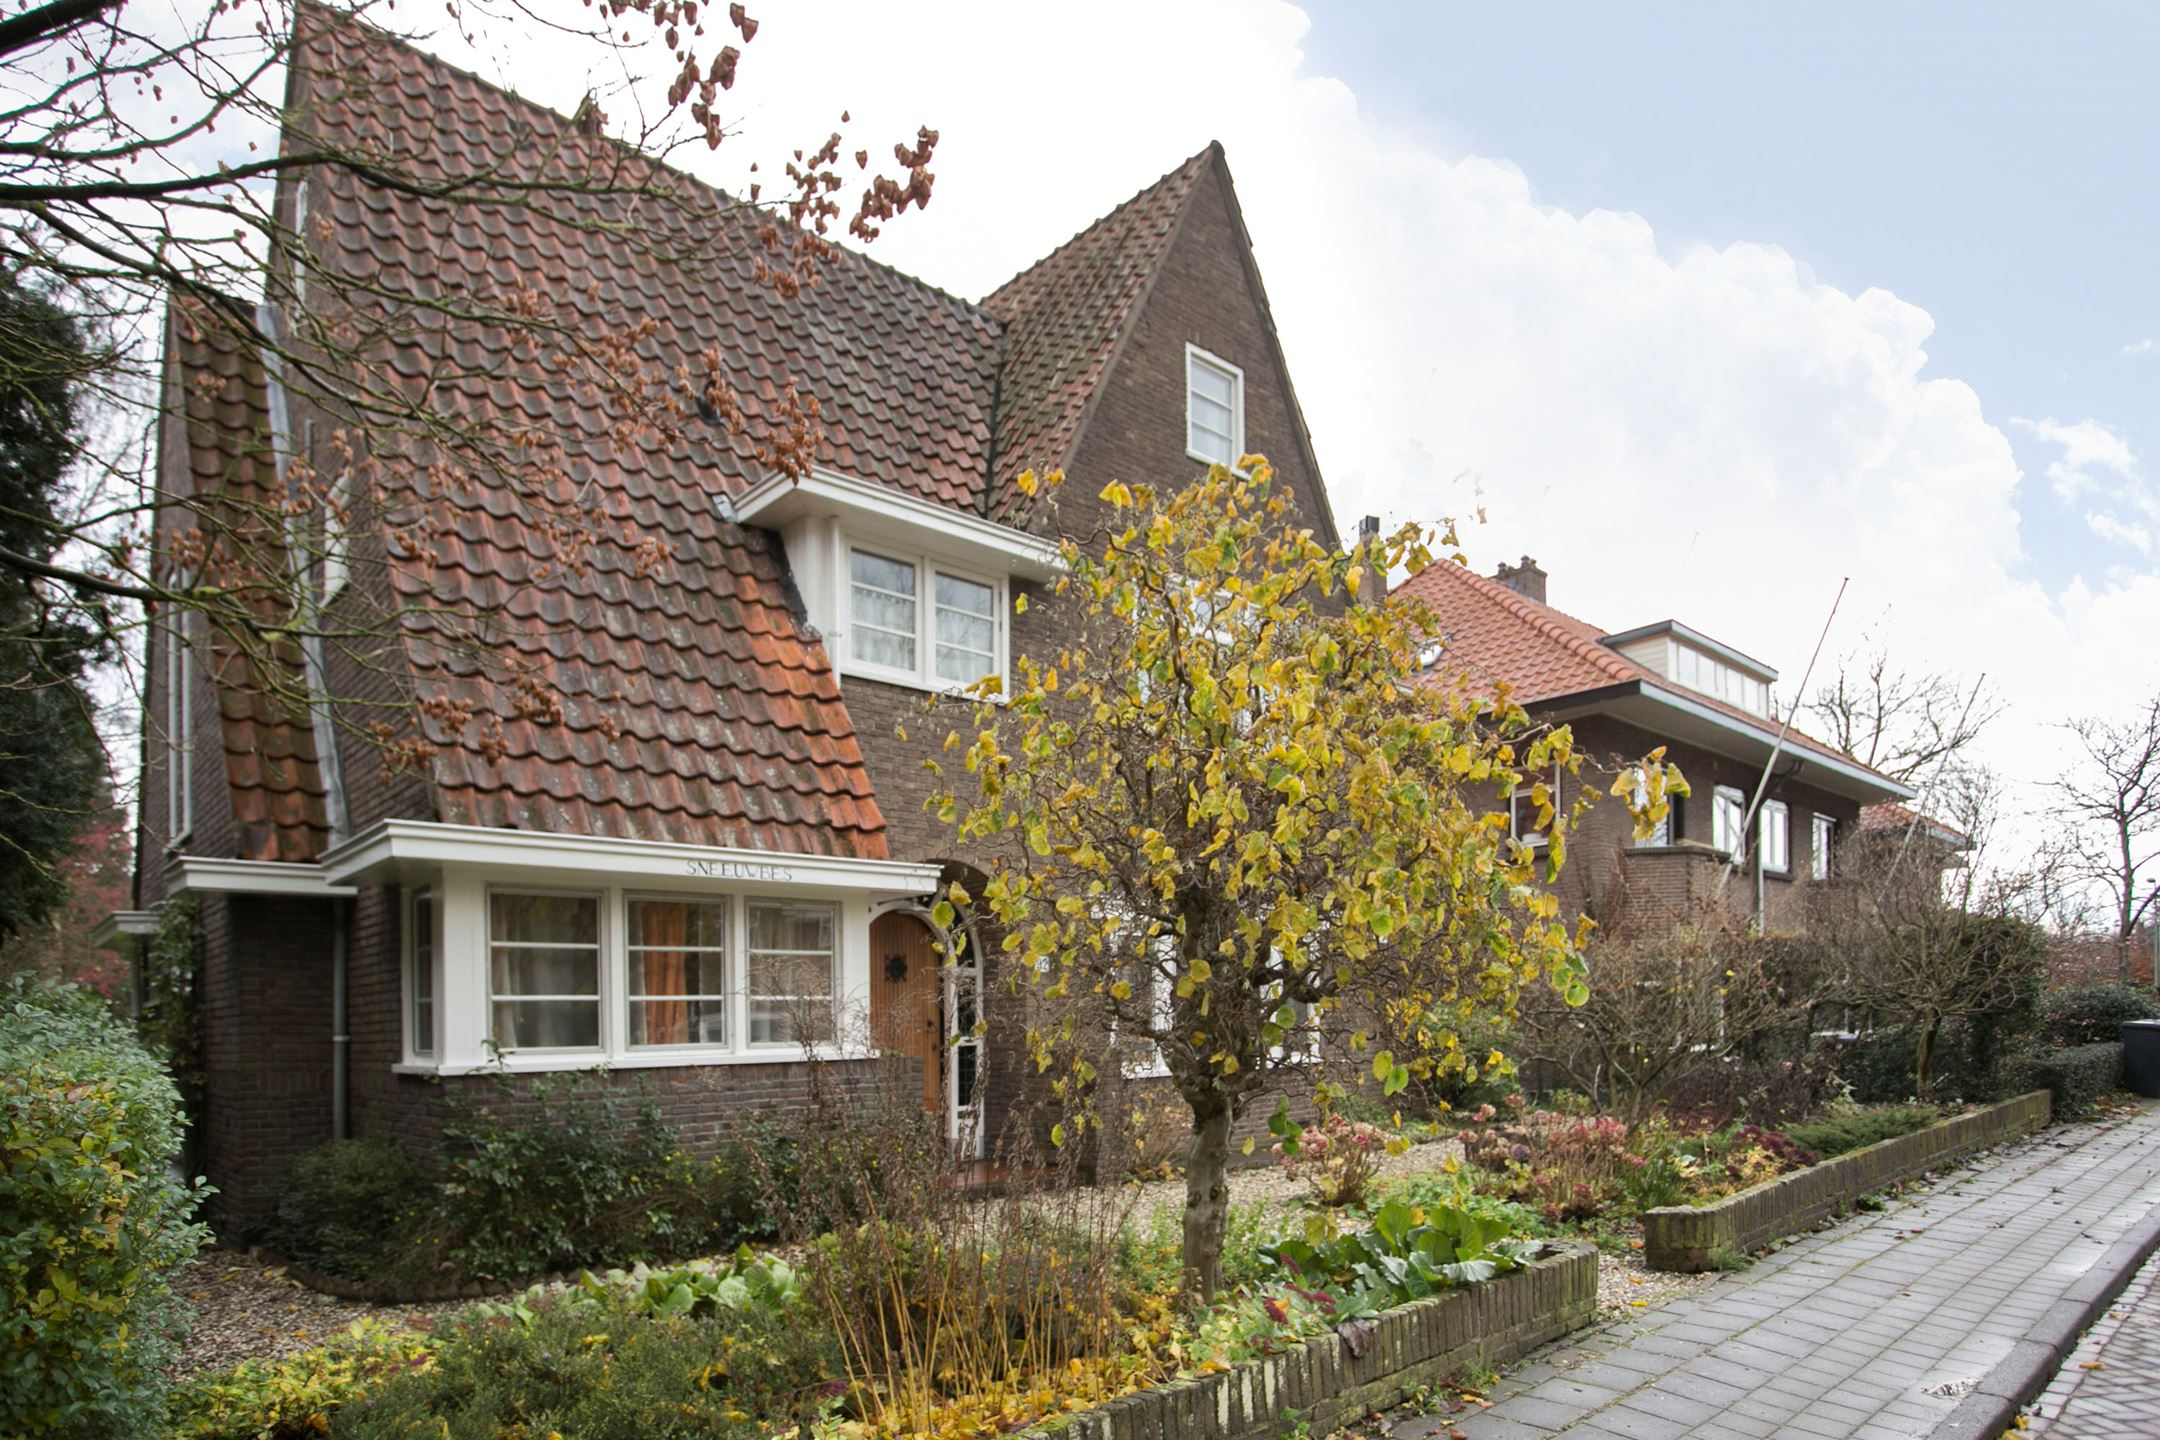 Verkocht deventerweg 92 7203 an zutphen funda for Funda zutphen